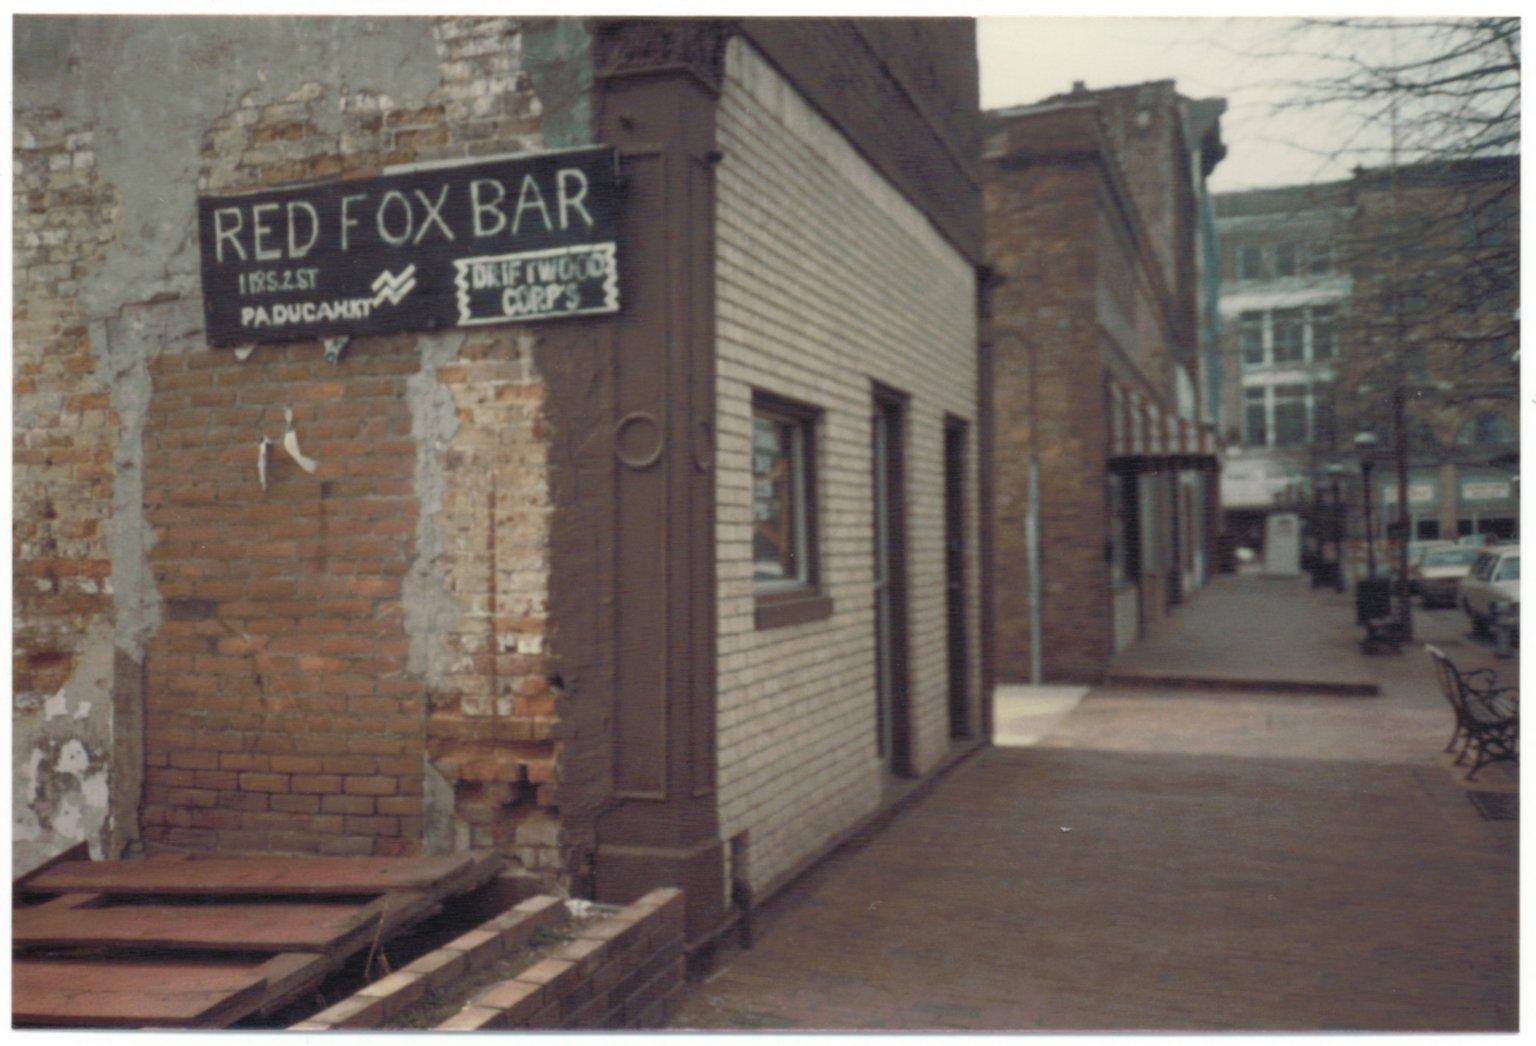 Red Fox Bar